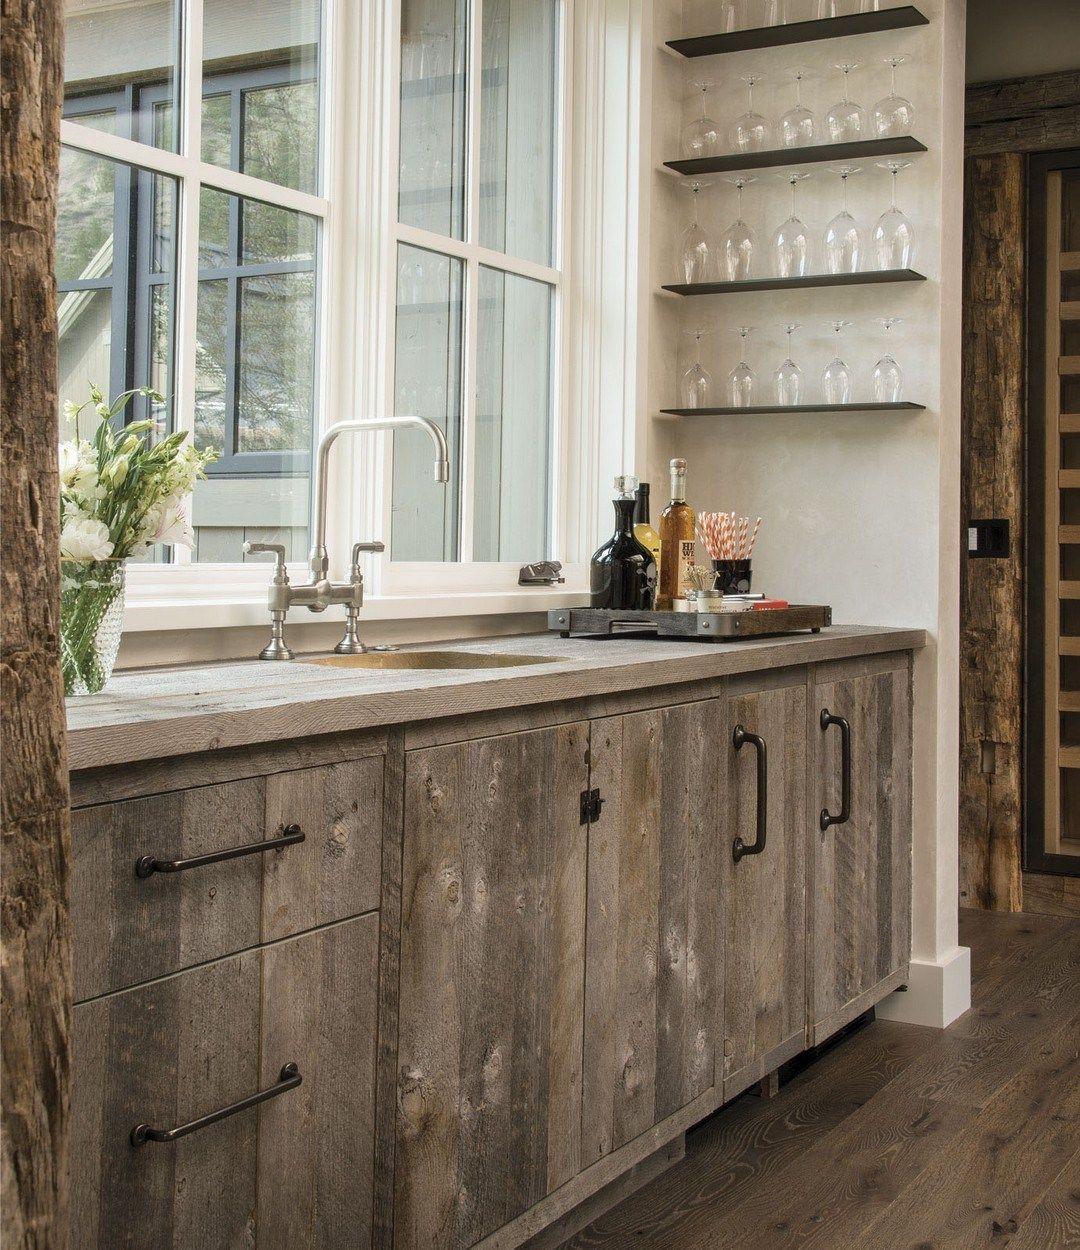 Amazing Rustic Mountain Farmhouse Decorating Ideas | Barn ...